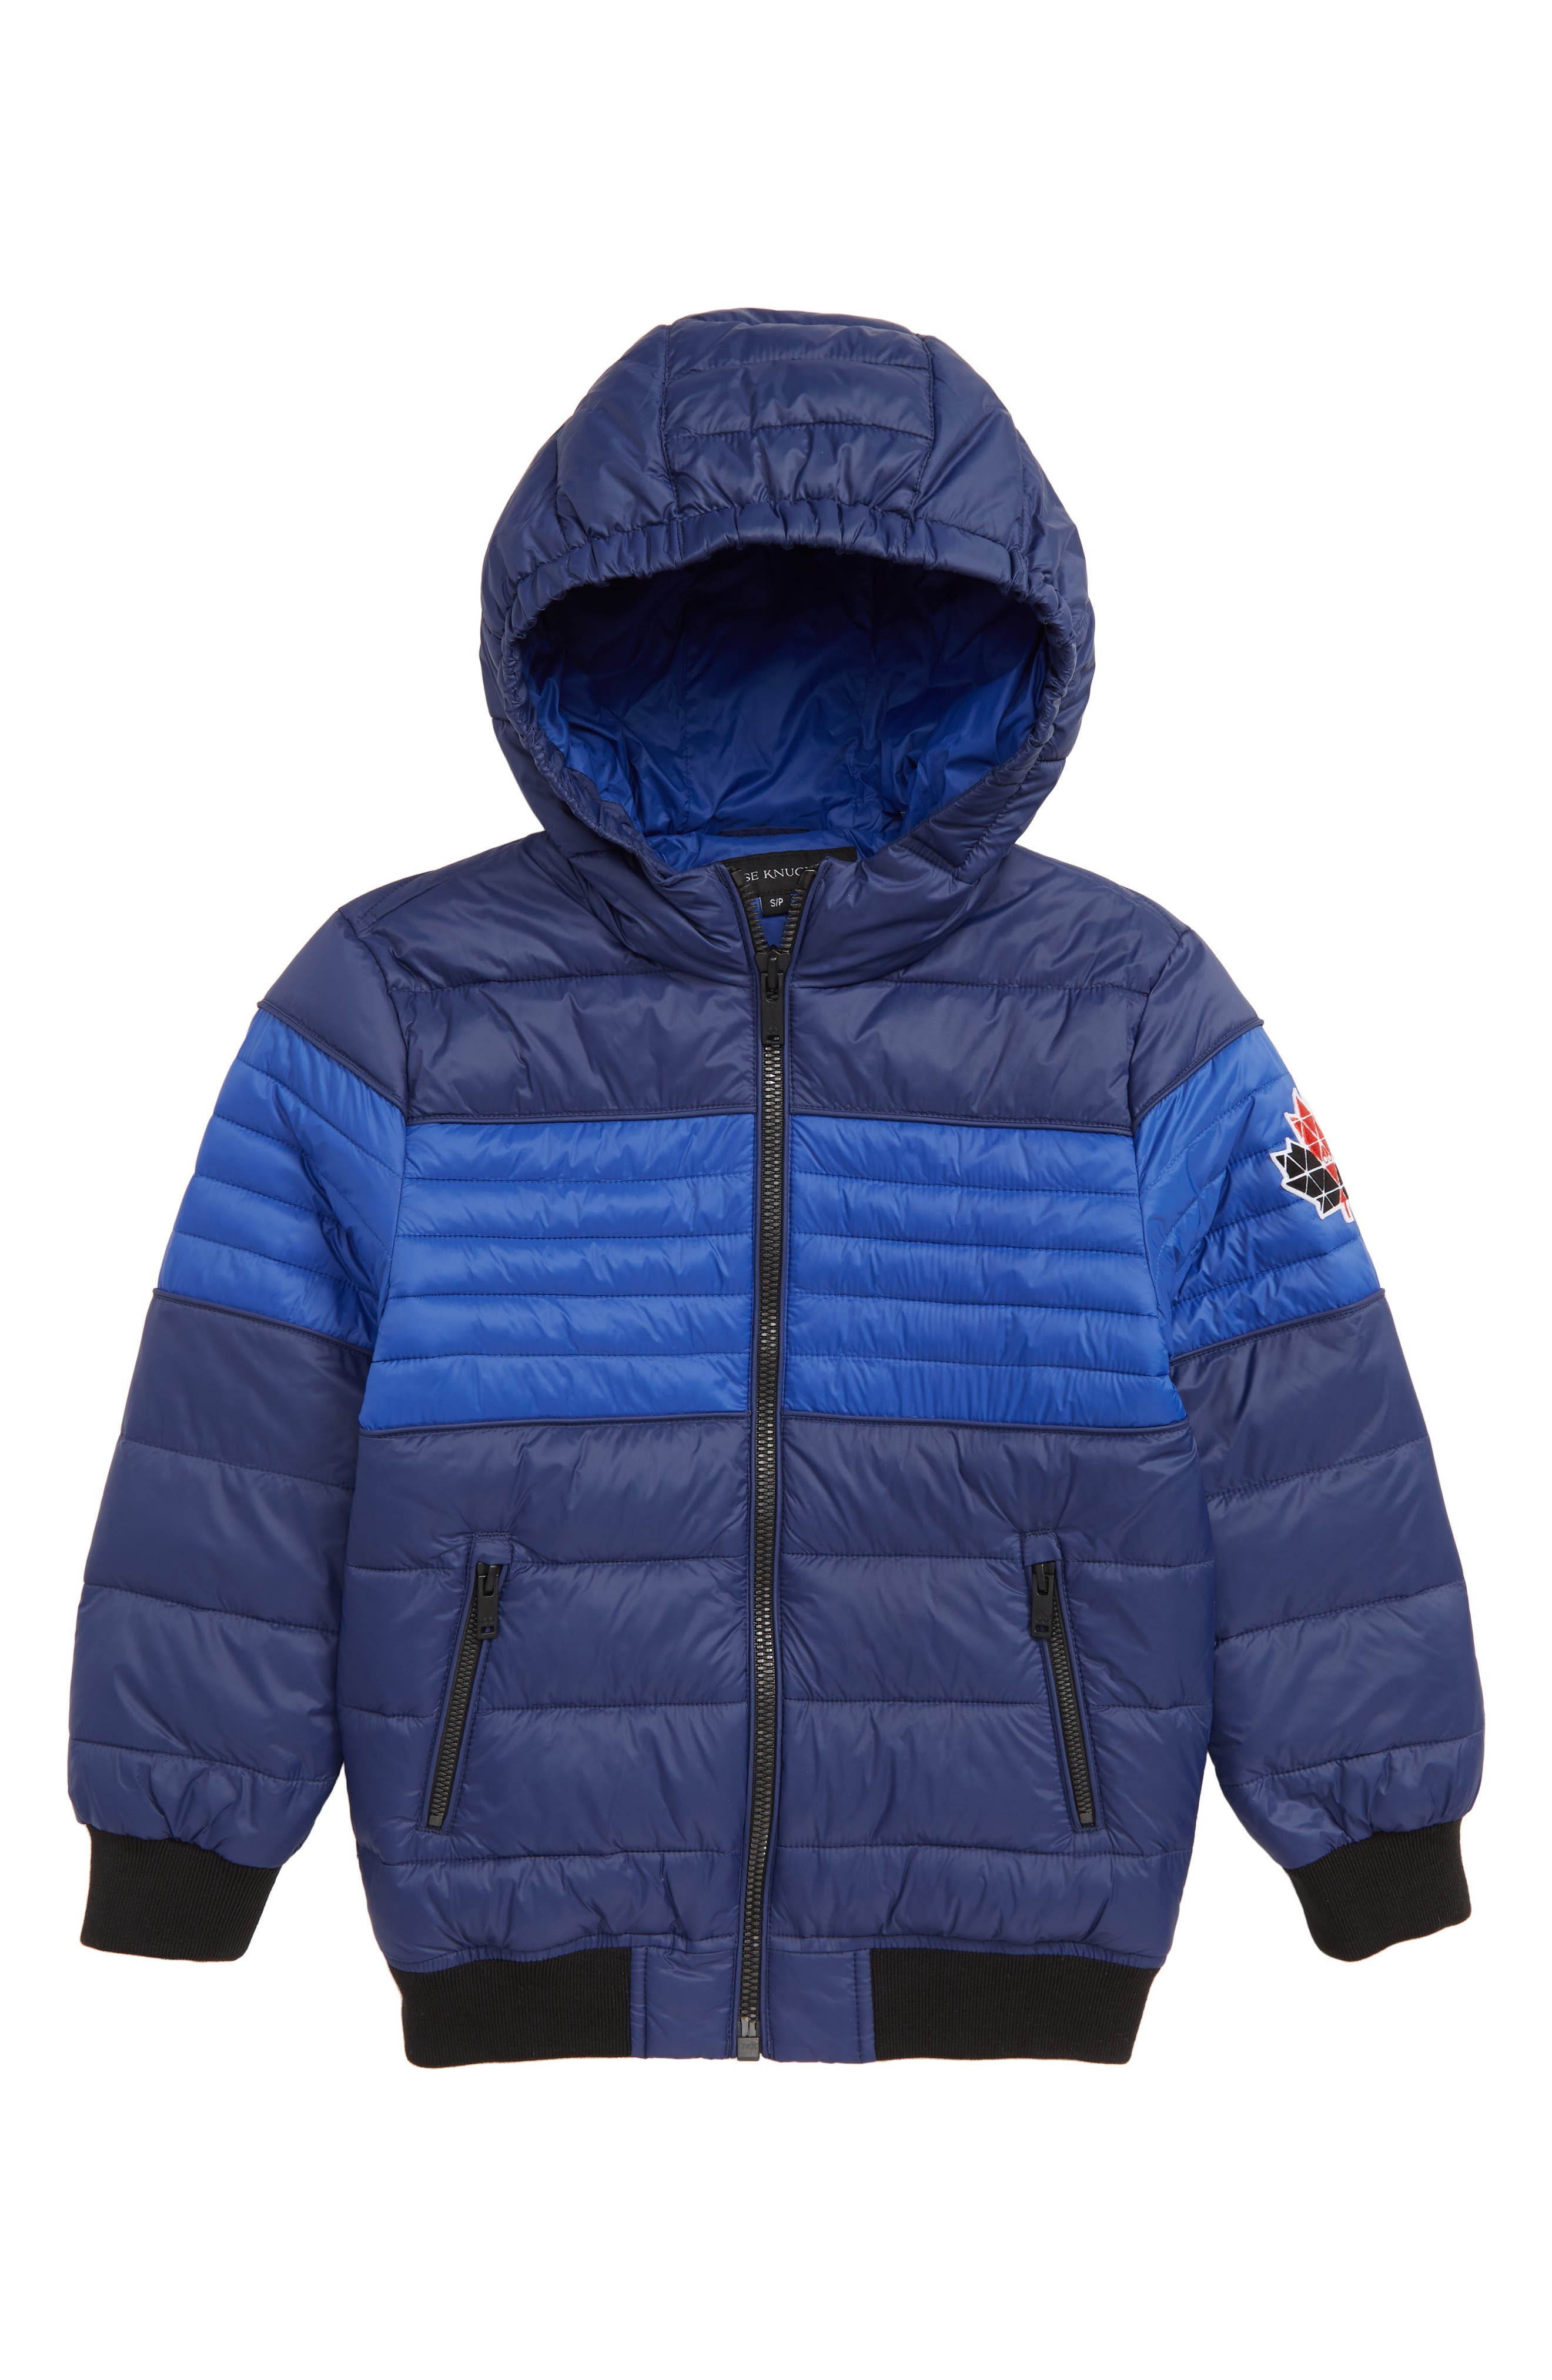 MOOSE KNUCKLES Peel Quilted Hooded Jacket, Main, color, NAVY